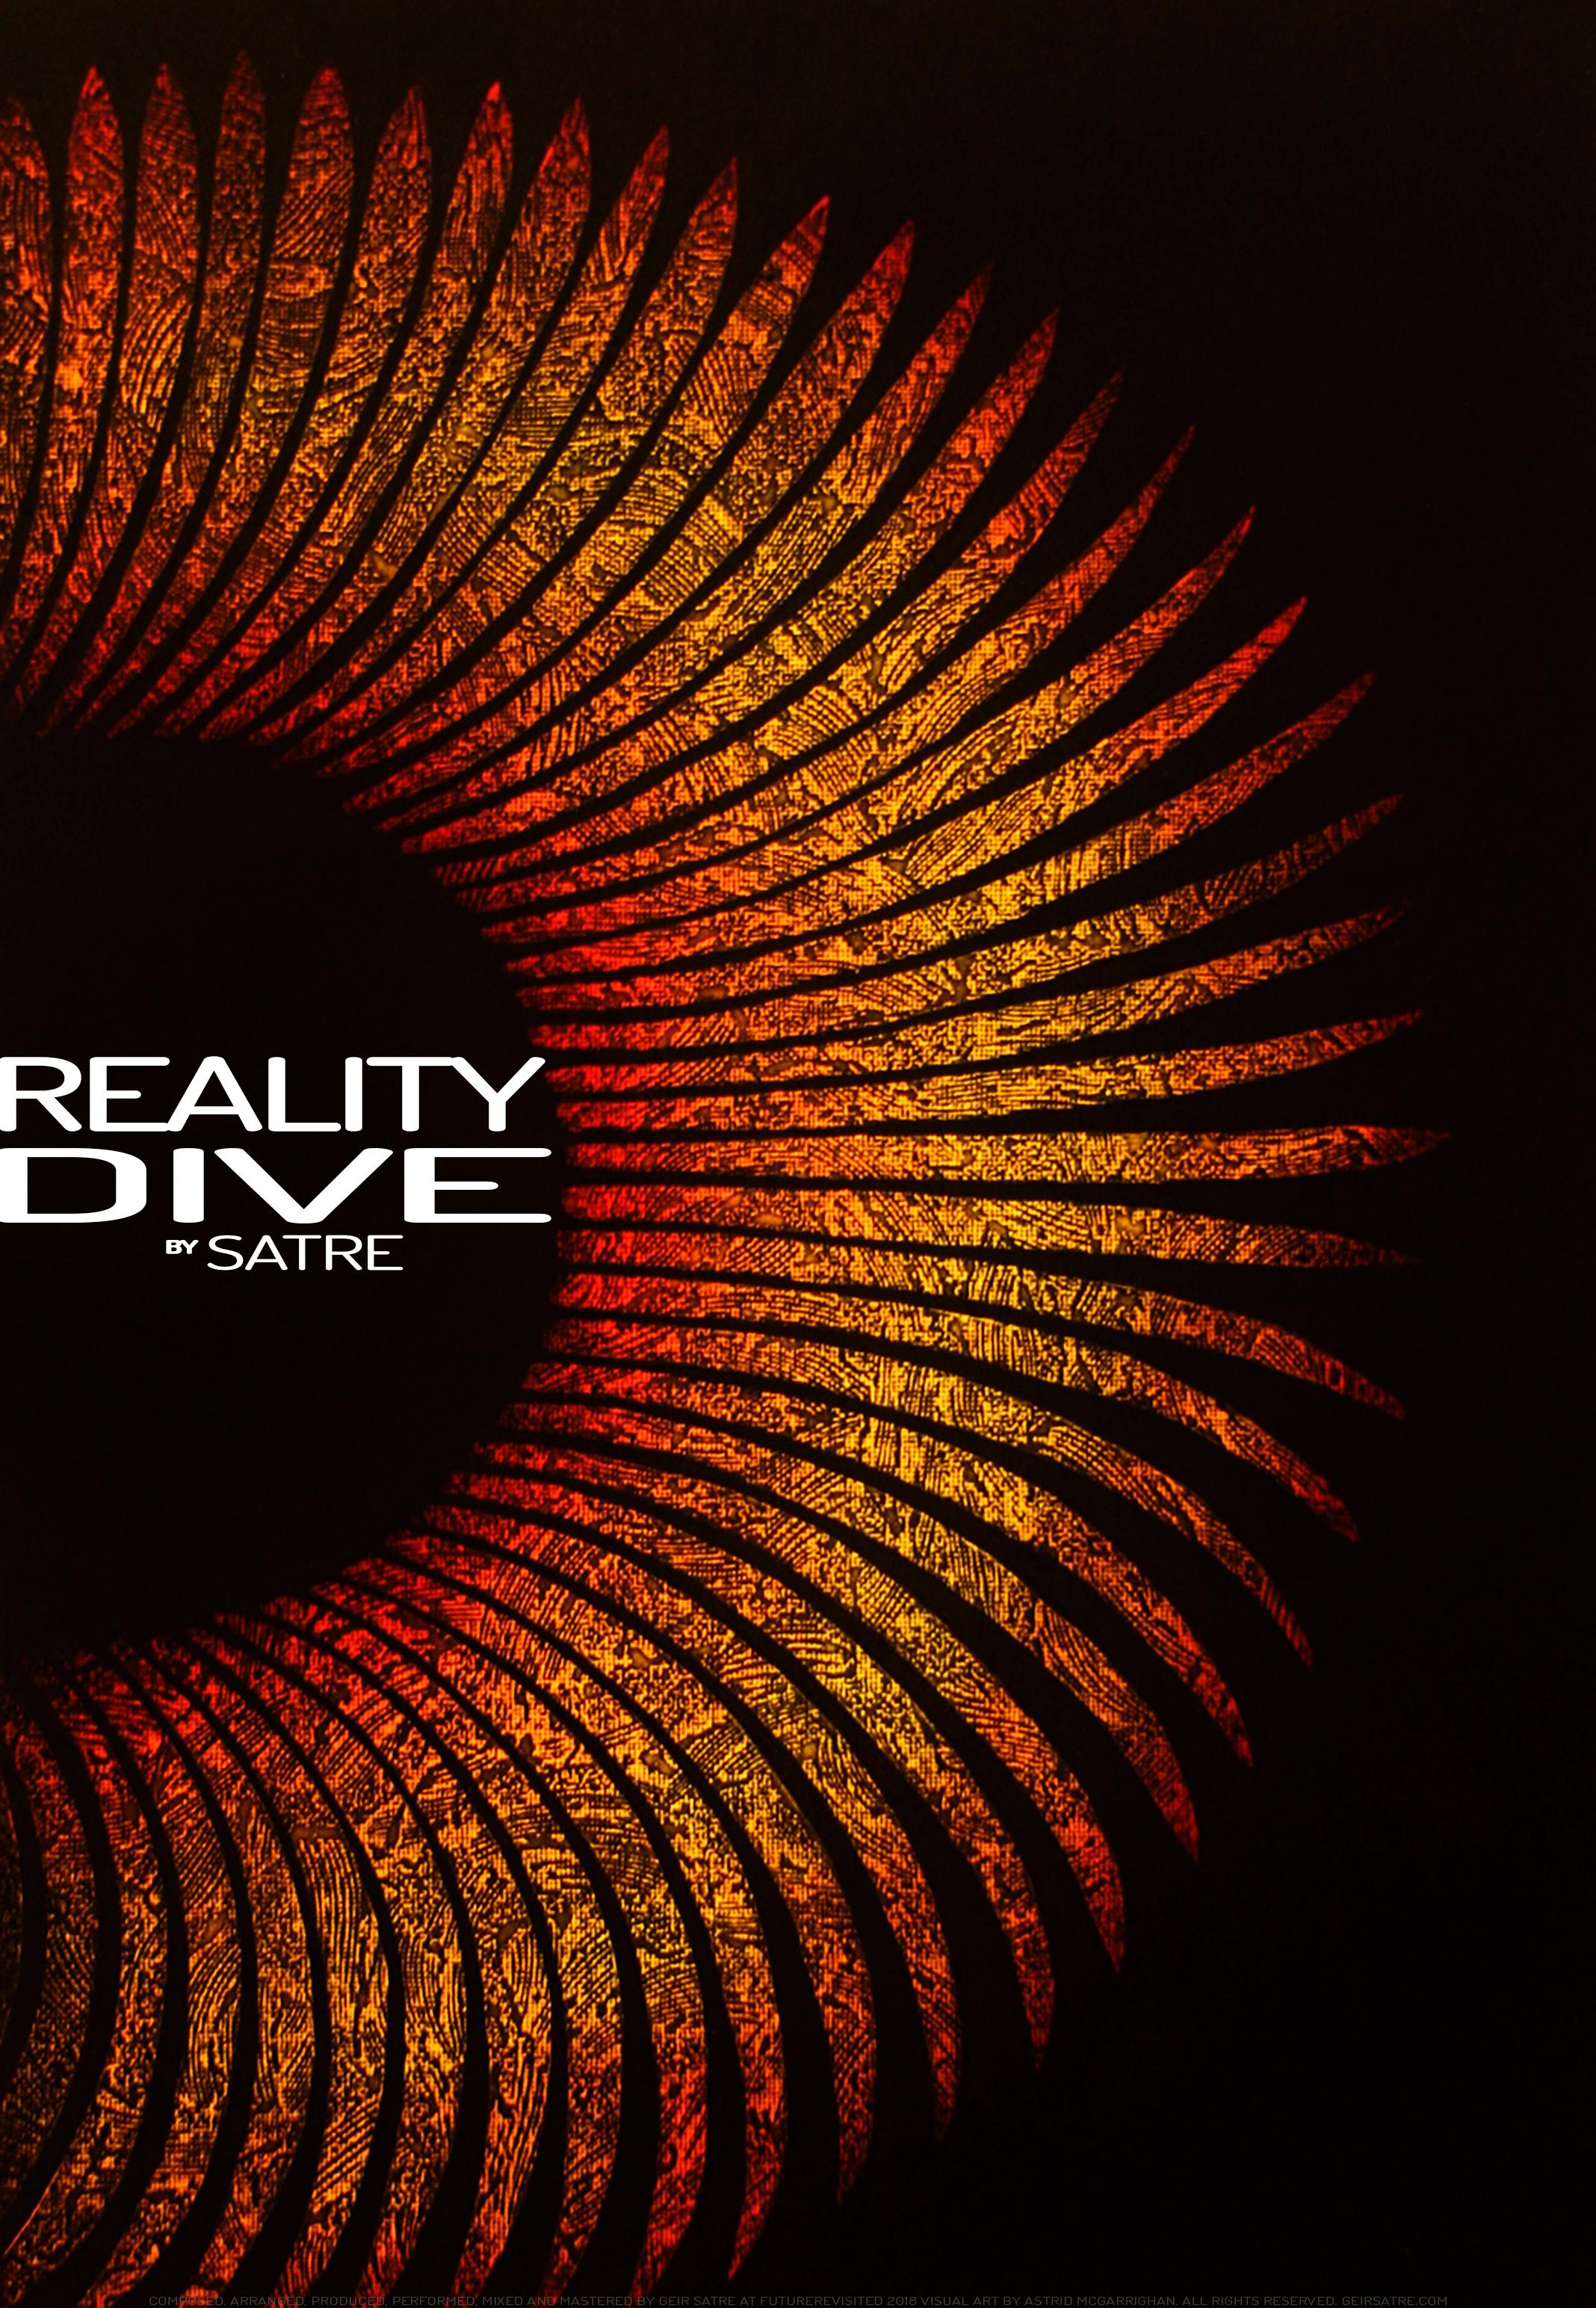 Reality-Dive-Artwork.jpg